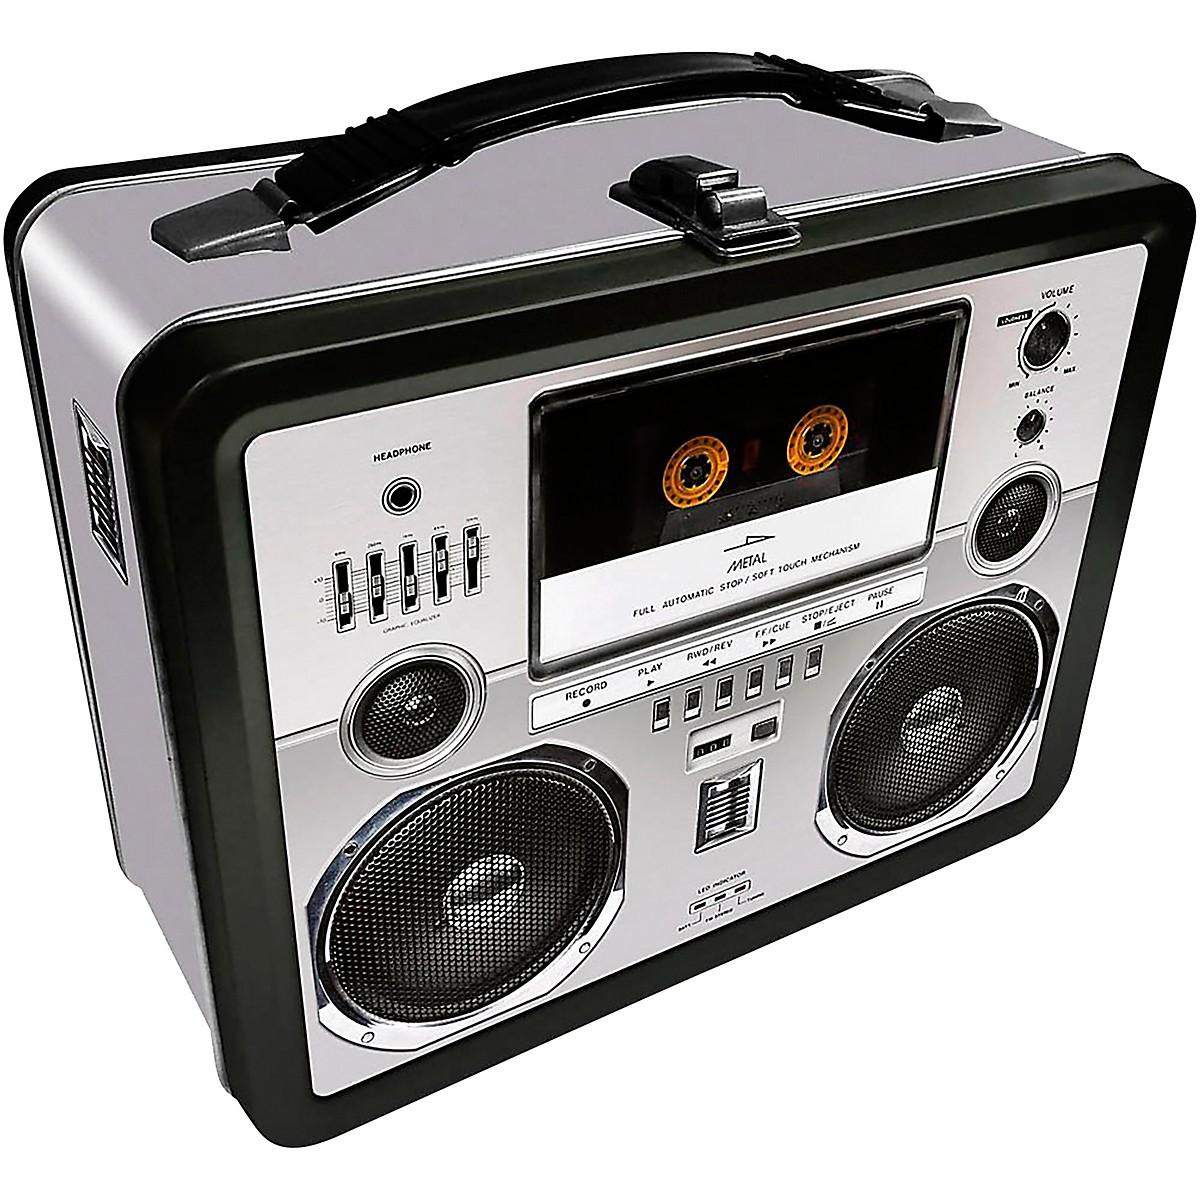 Hal Leonard Boombox Gen 2 Model Lunch Box